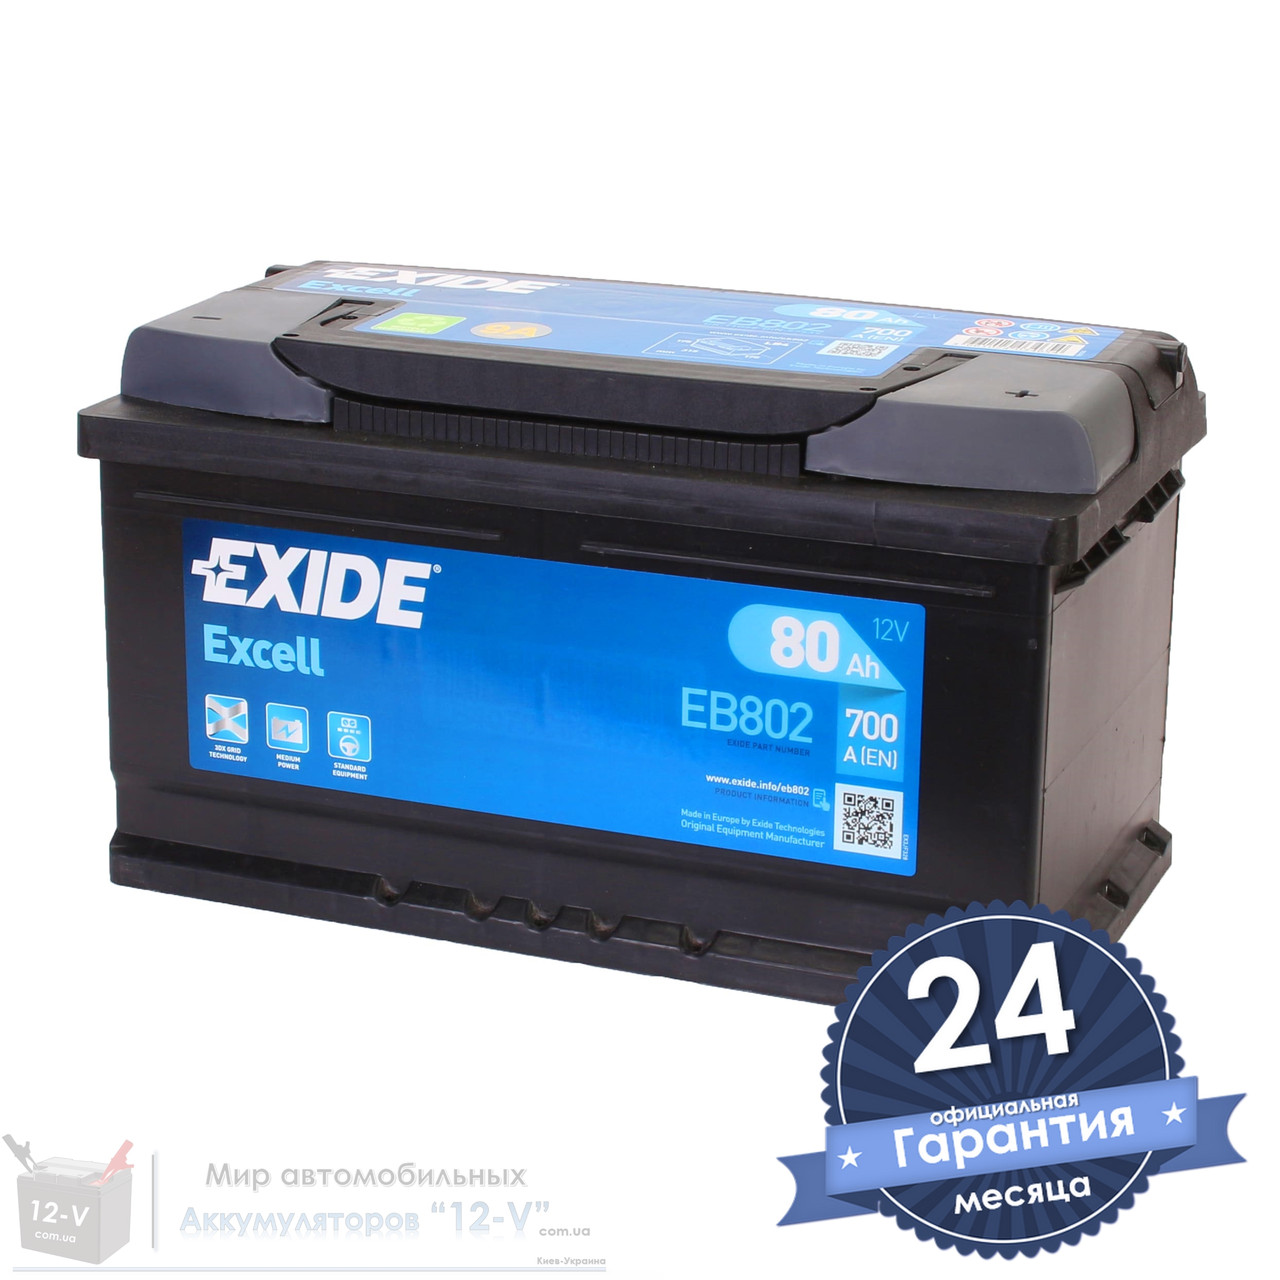 Аккумулятор автомобильный EXIDE Excell 6CT 80Ah, пусковой ток 700А [–|+] (EB802)